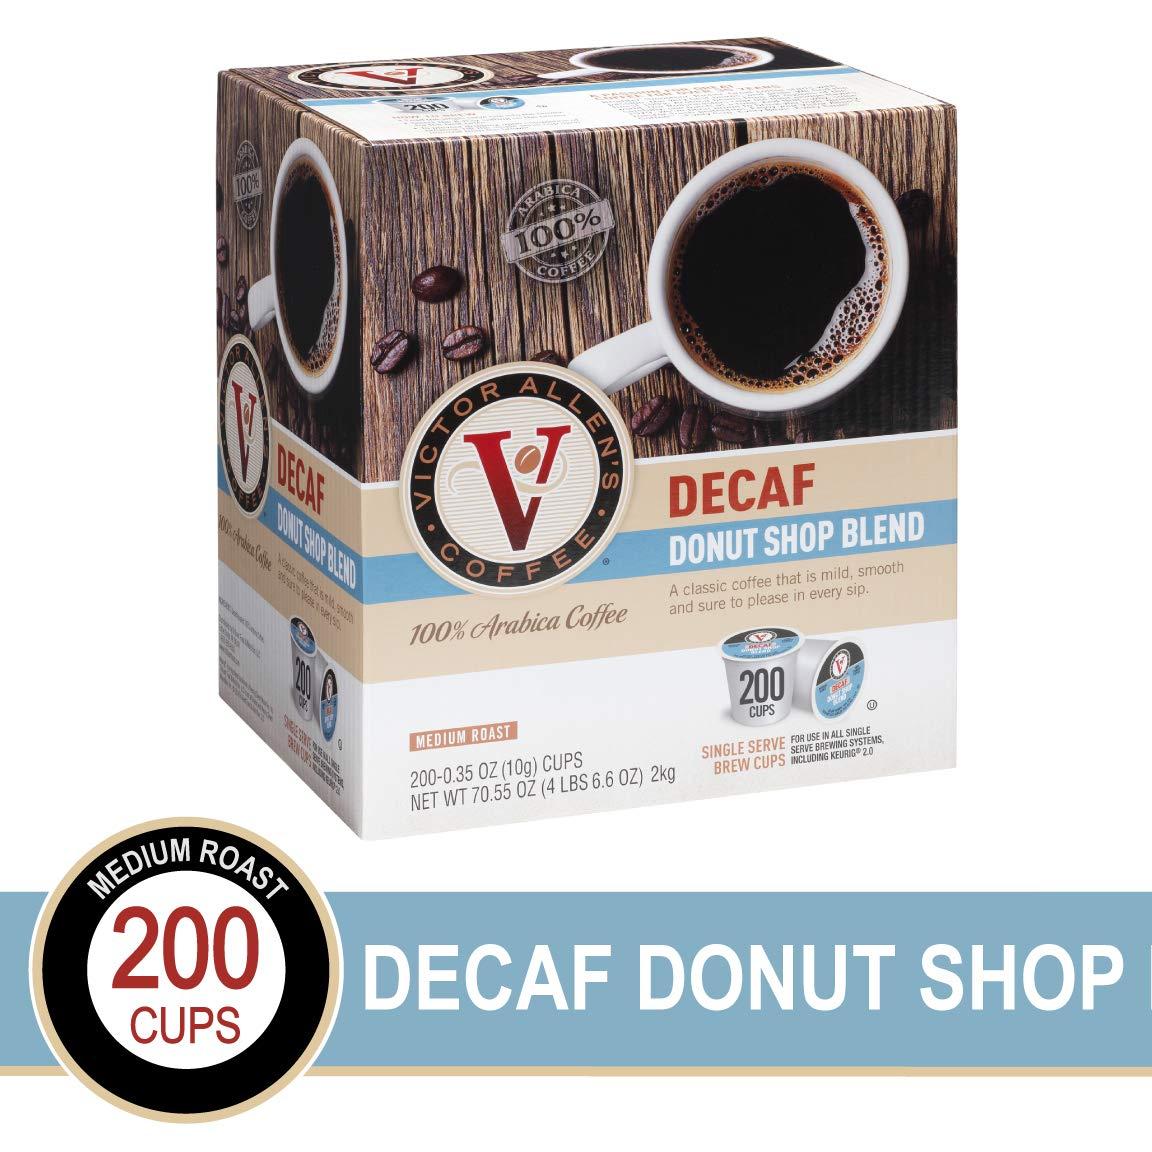 Deacf Donut Shop Blend for K-Cup Keurig 2.0 Brewers, 200 Count, Victor Allen's Coffee Medium Roast Single Serve Coffee Pods by Victor Allen